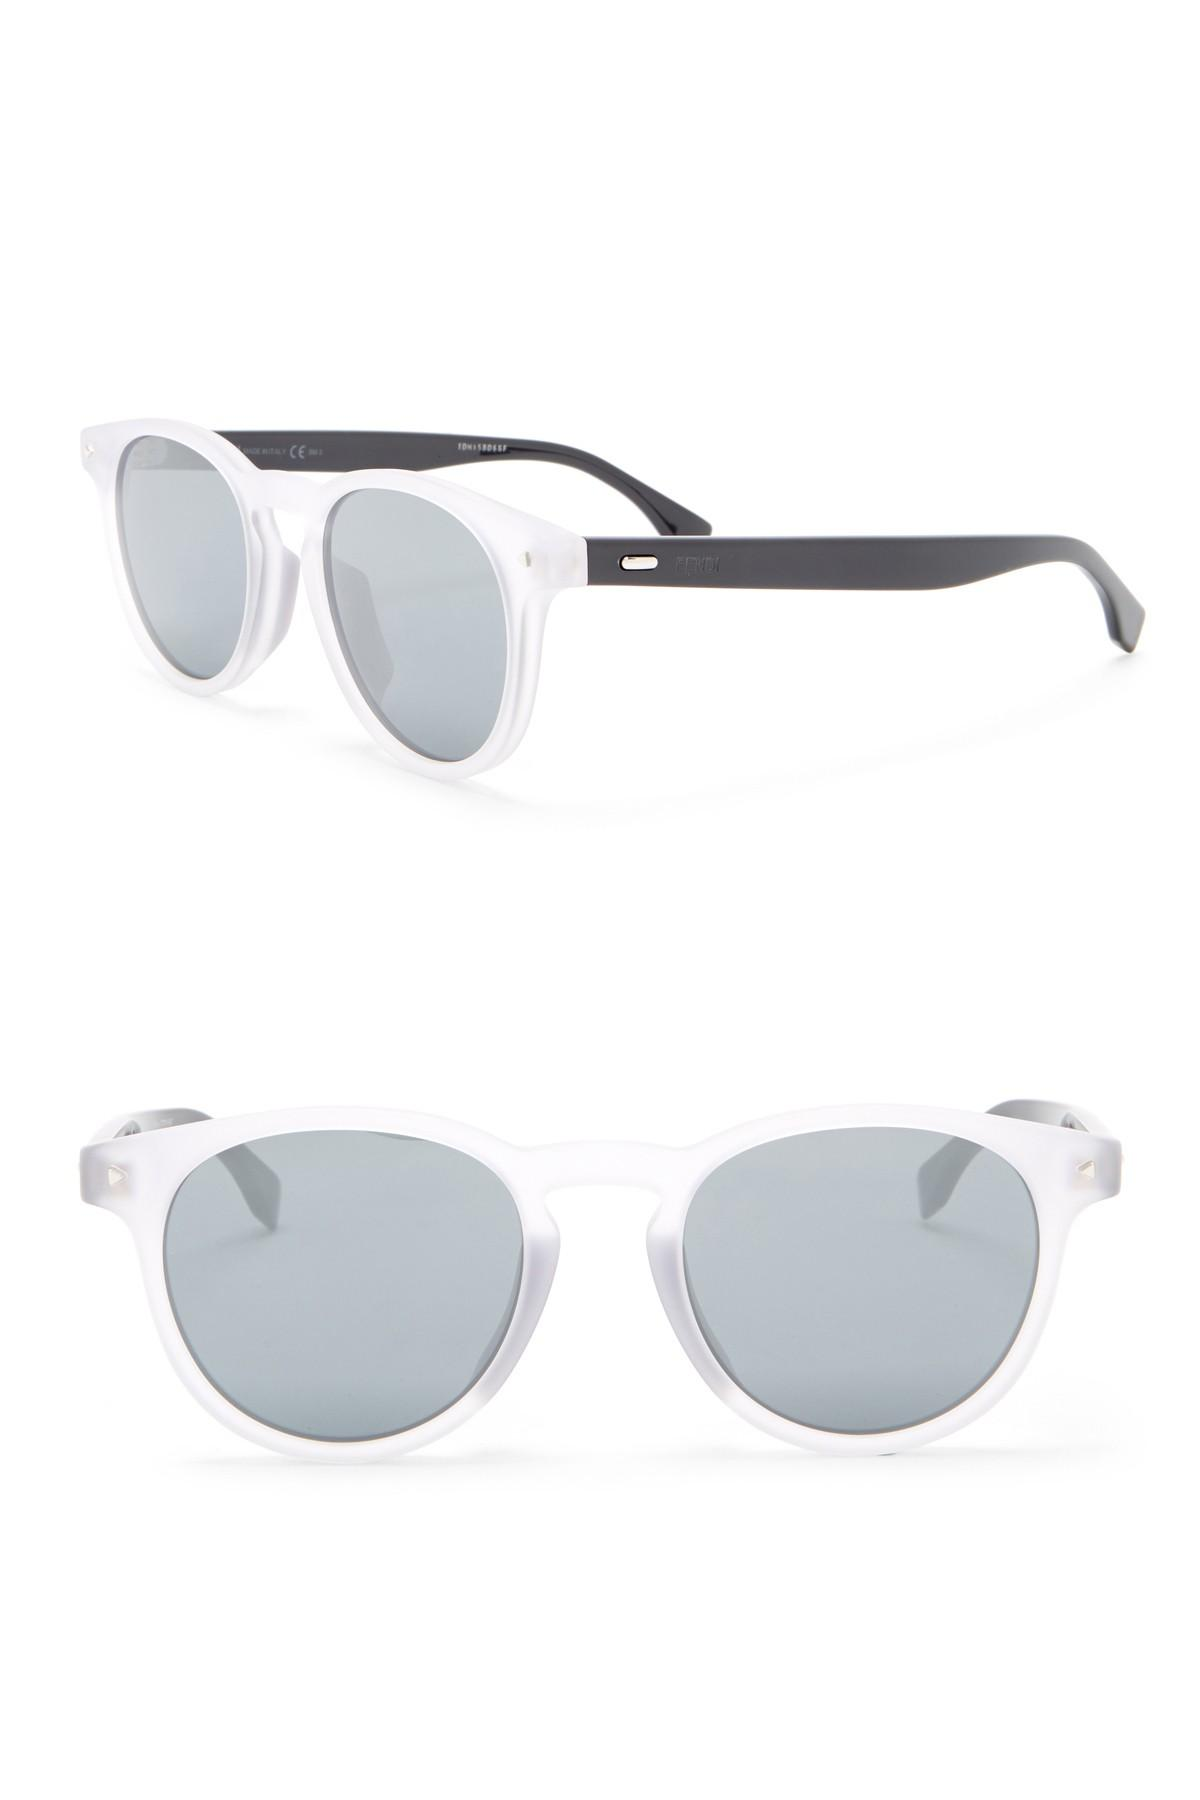 b277b6a4f0b Lyst - Fendi Modified Oval 49mm Sunglasses in White for Men